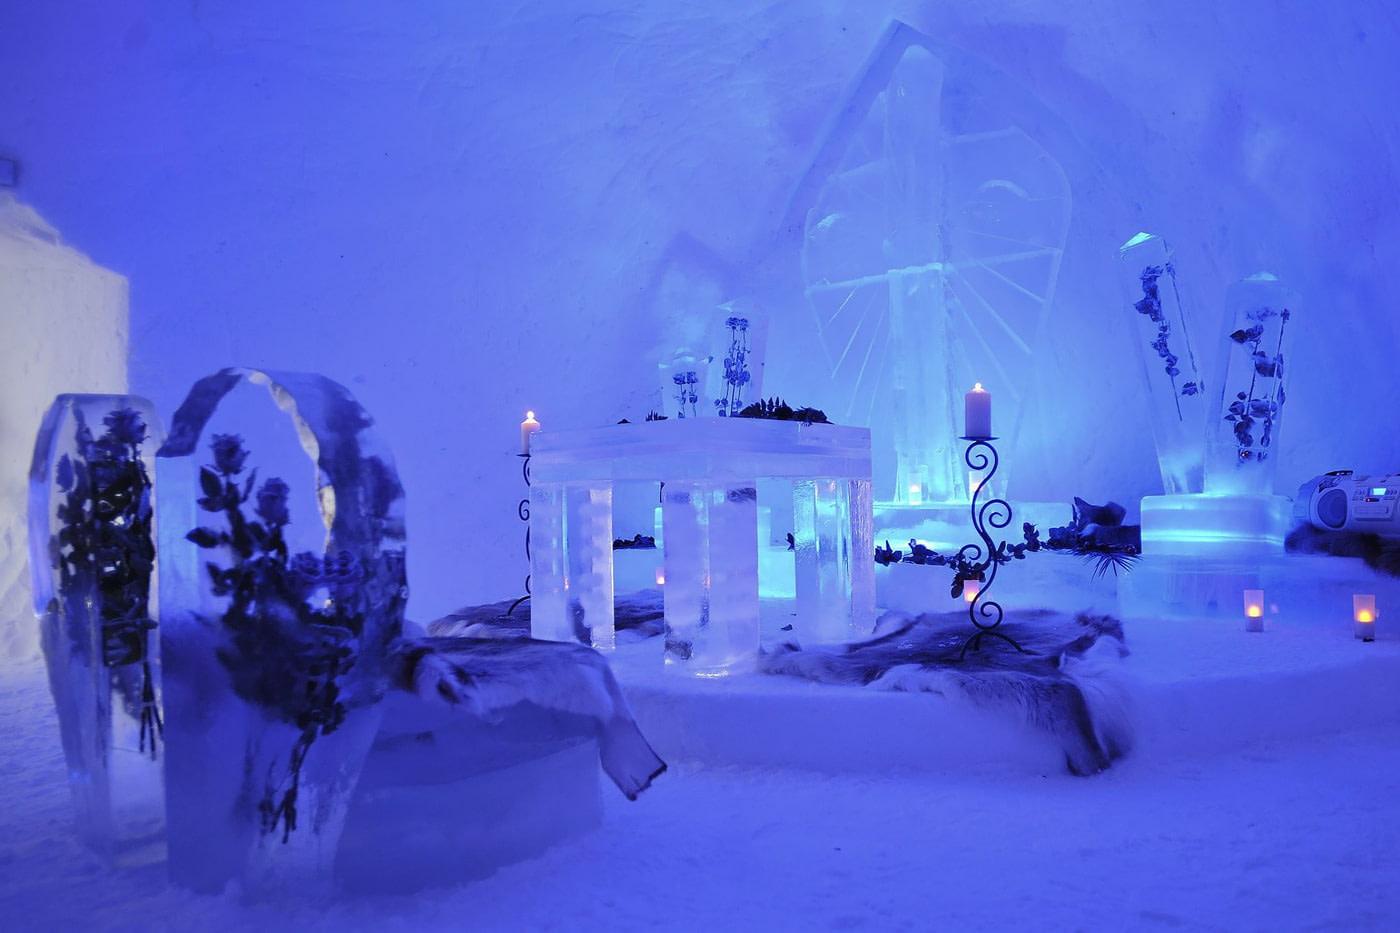 Ice hotel in Austria